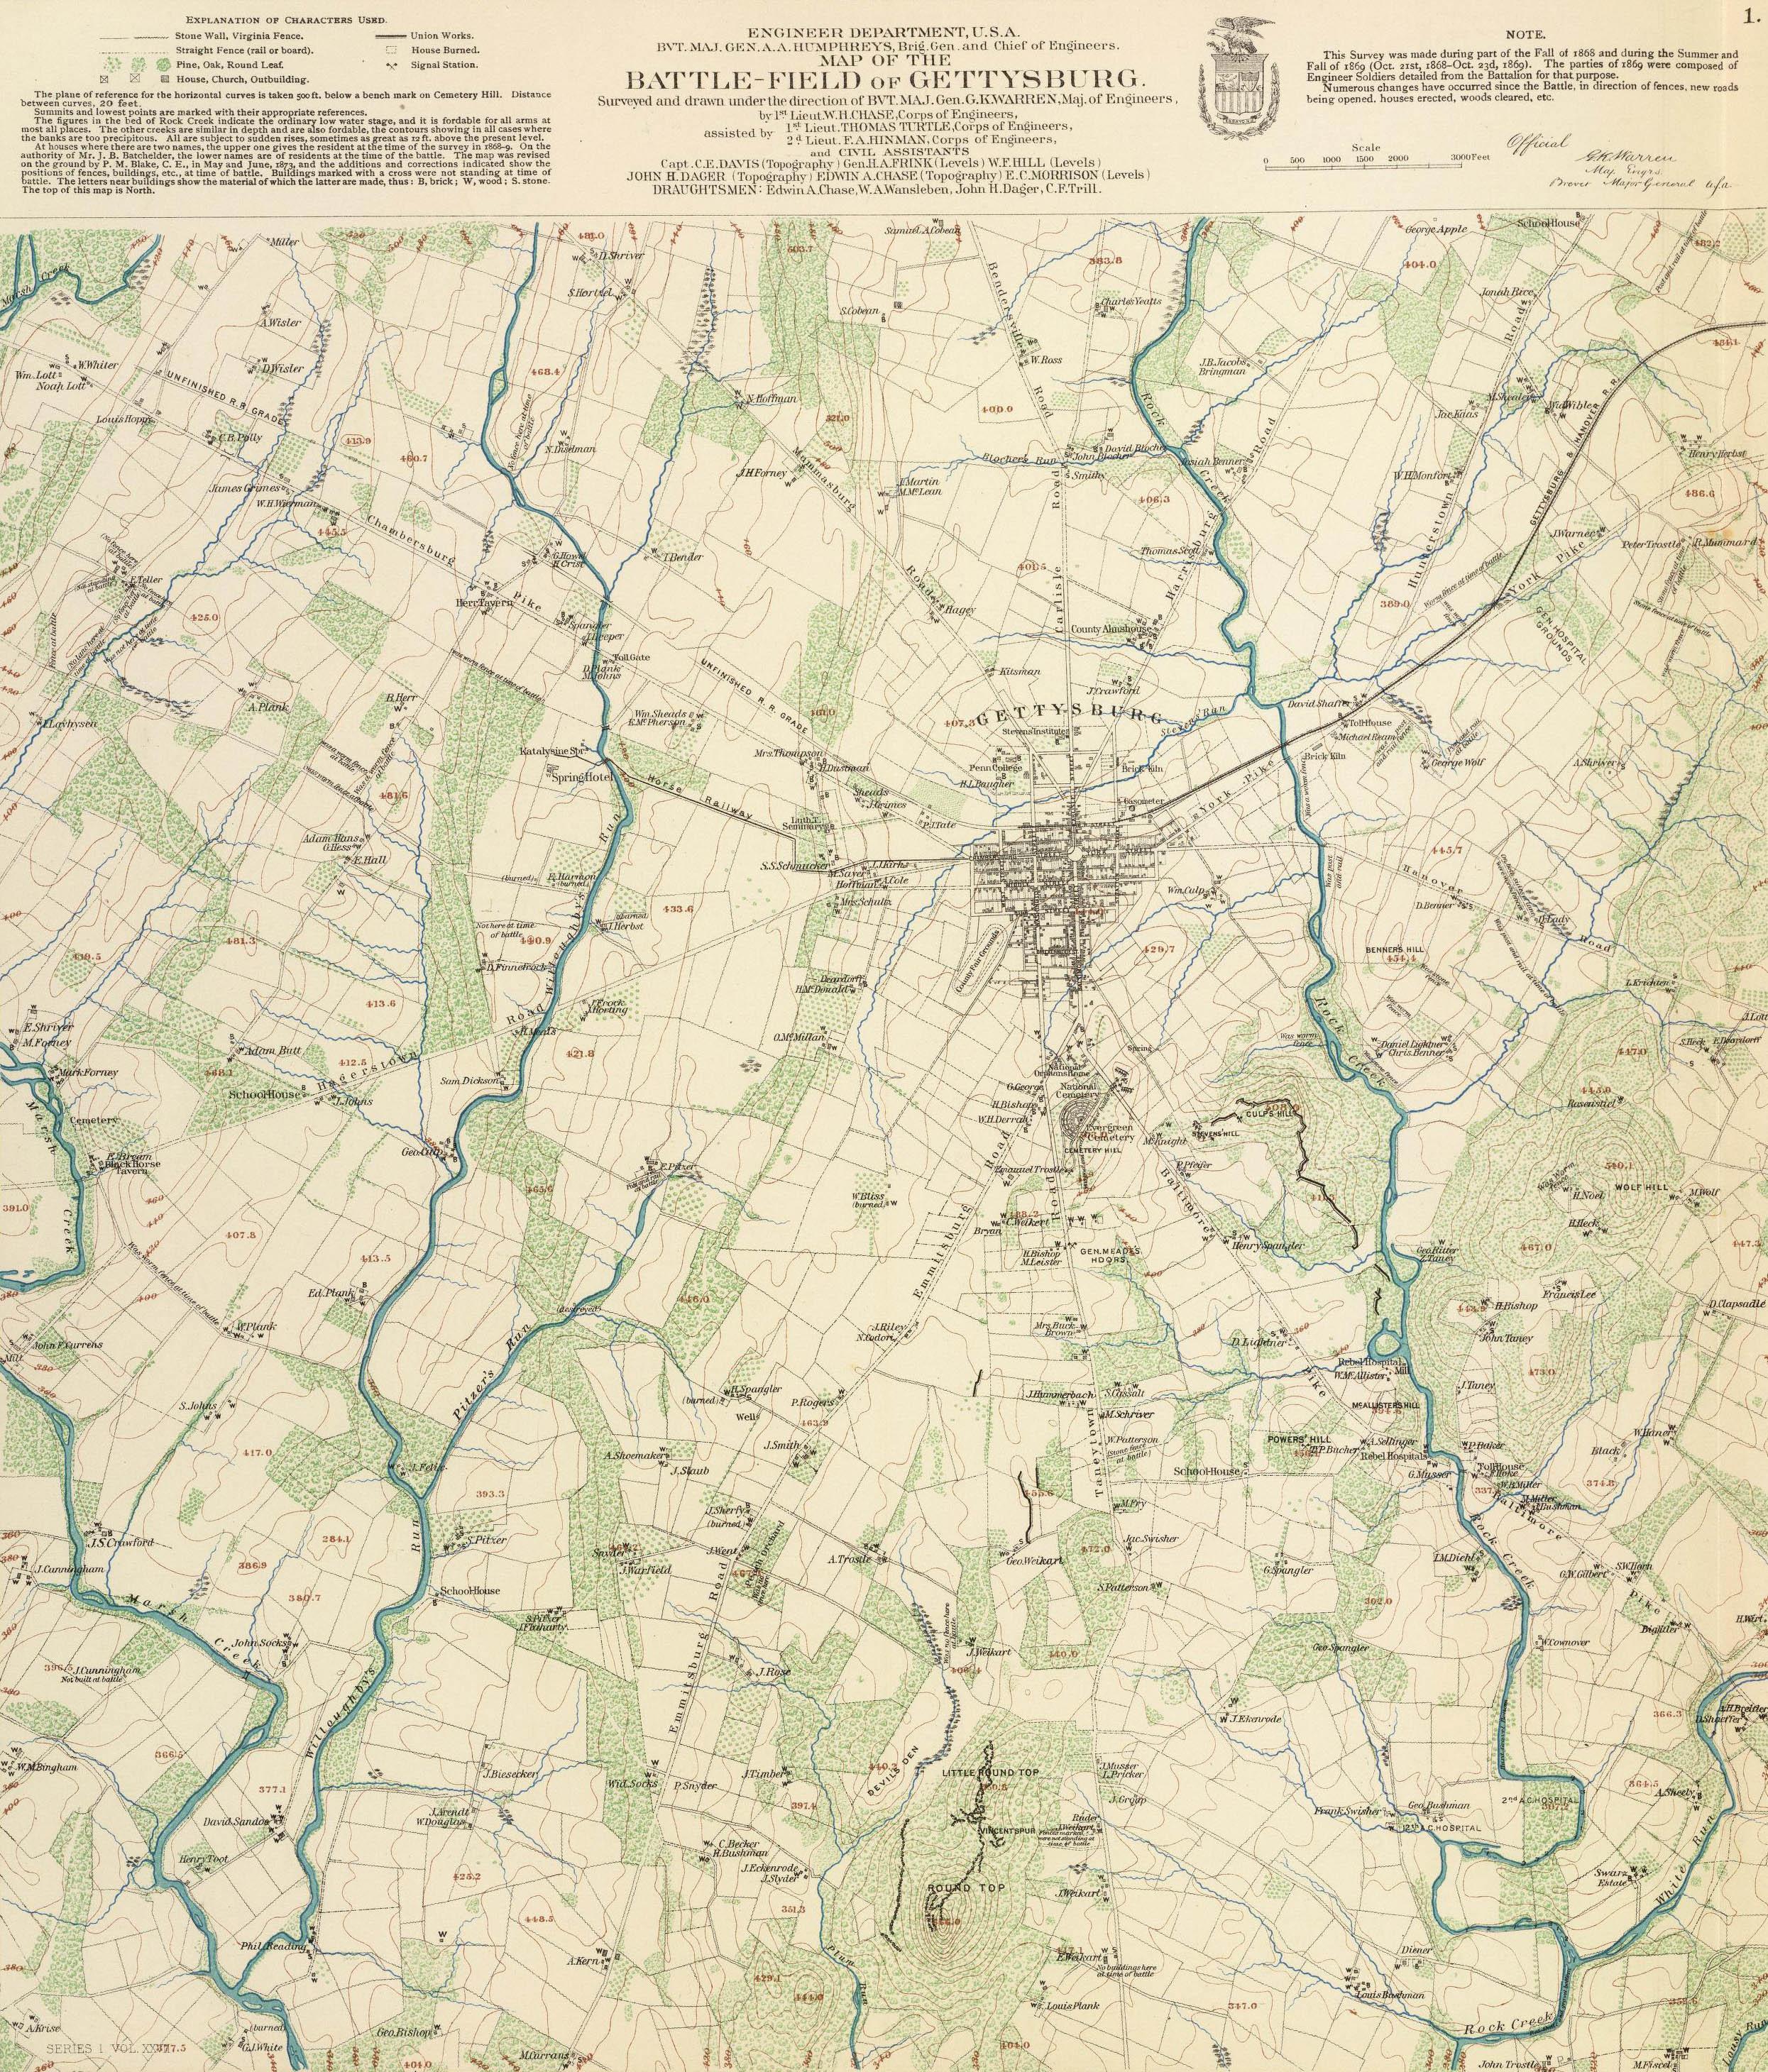 Gettysburg Topographic Map.Gettysburg